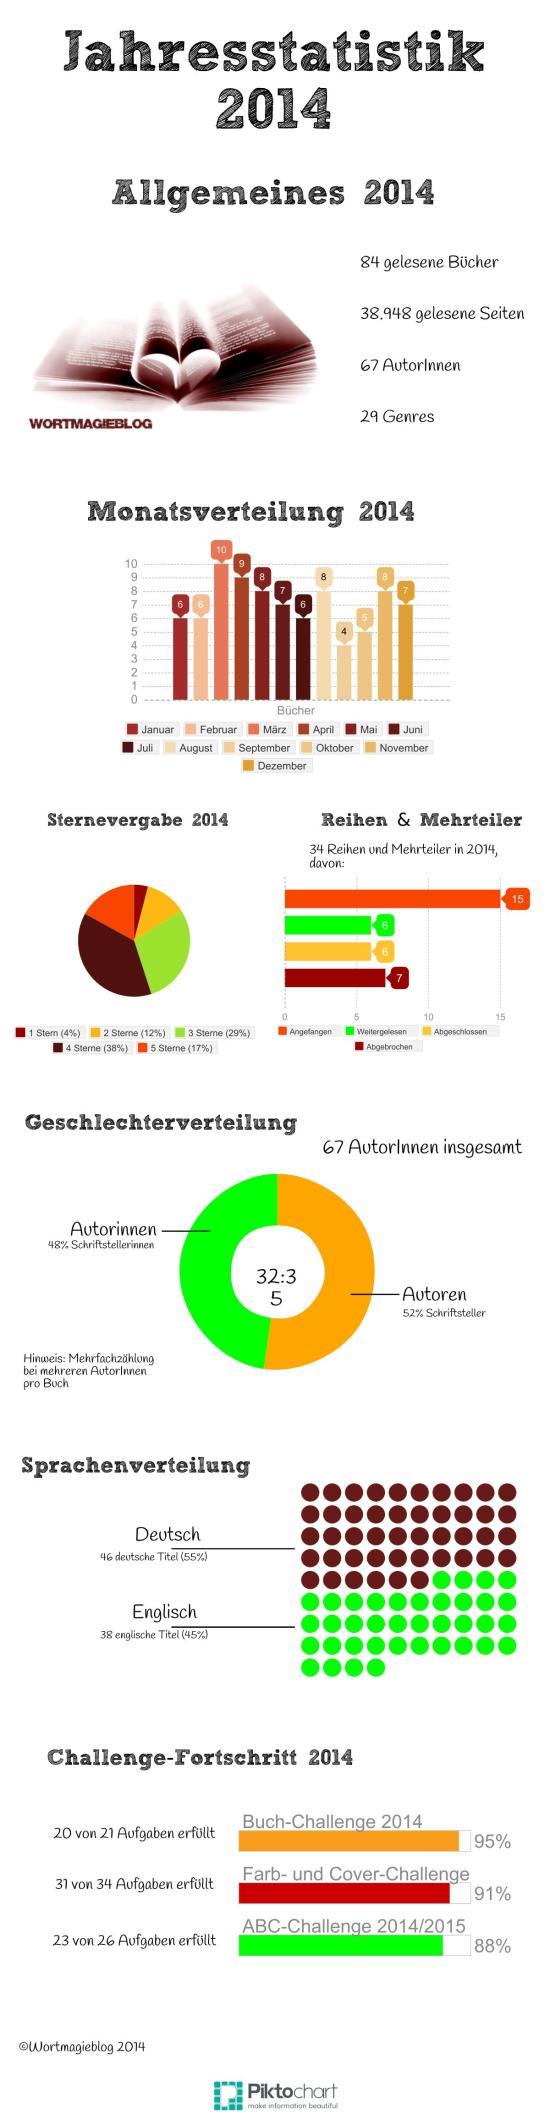 Jahresstatistik 2014